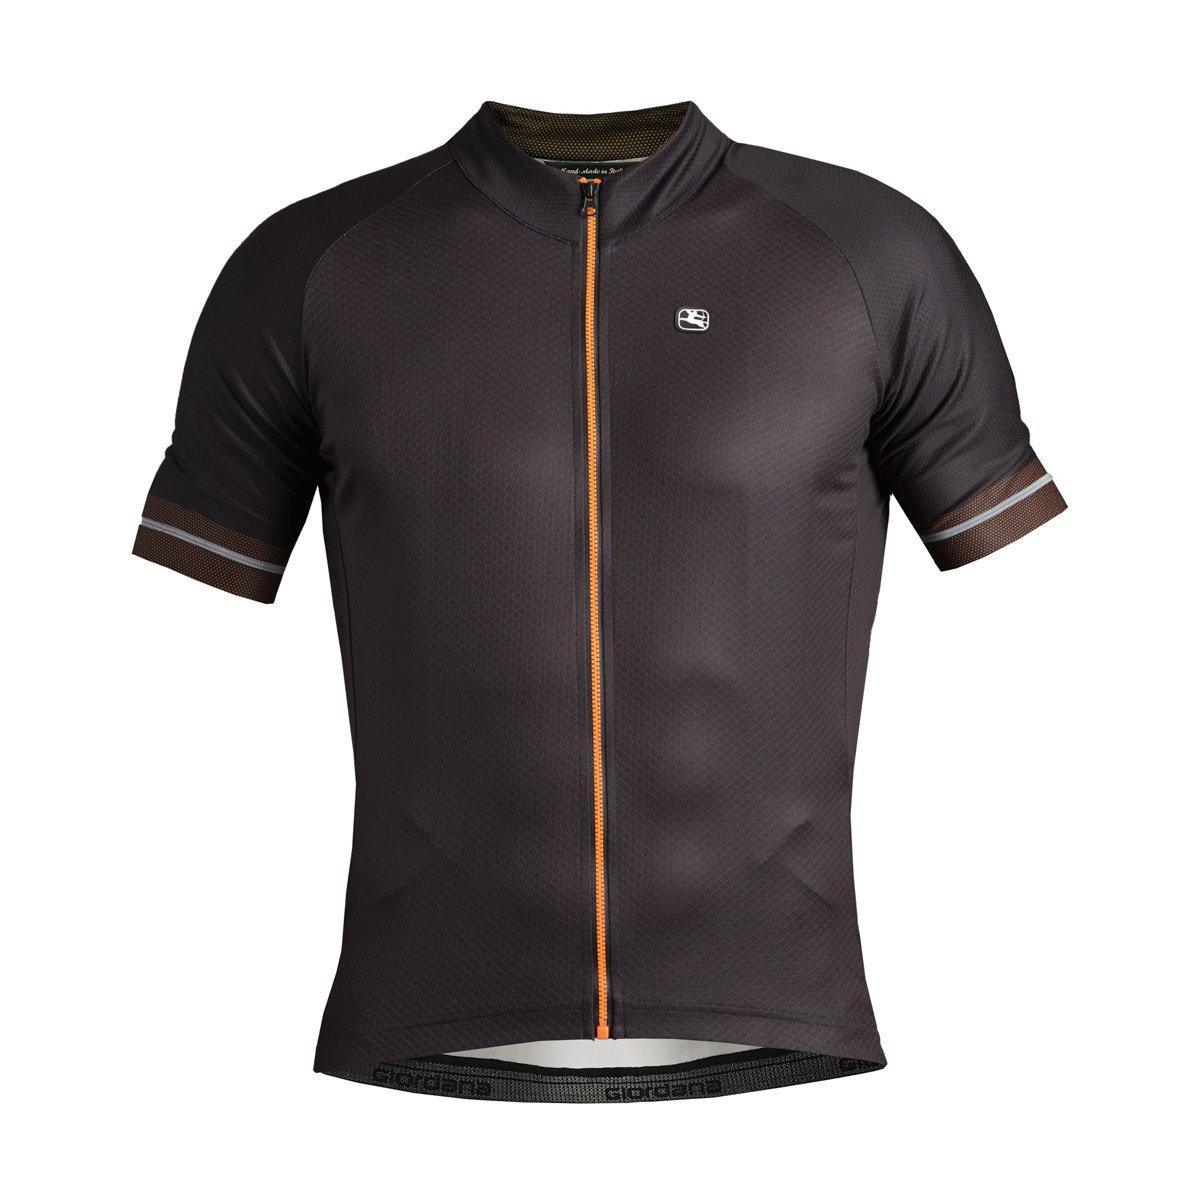 Giordana Lungo Jersey – Men 's B077F5W8LN Large|ブラック/オレンジ ブラック/オレンジ Large